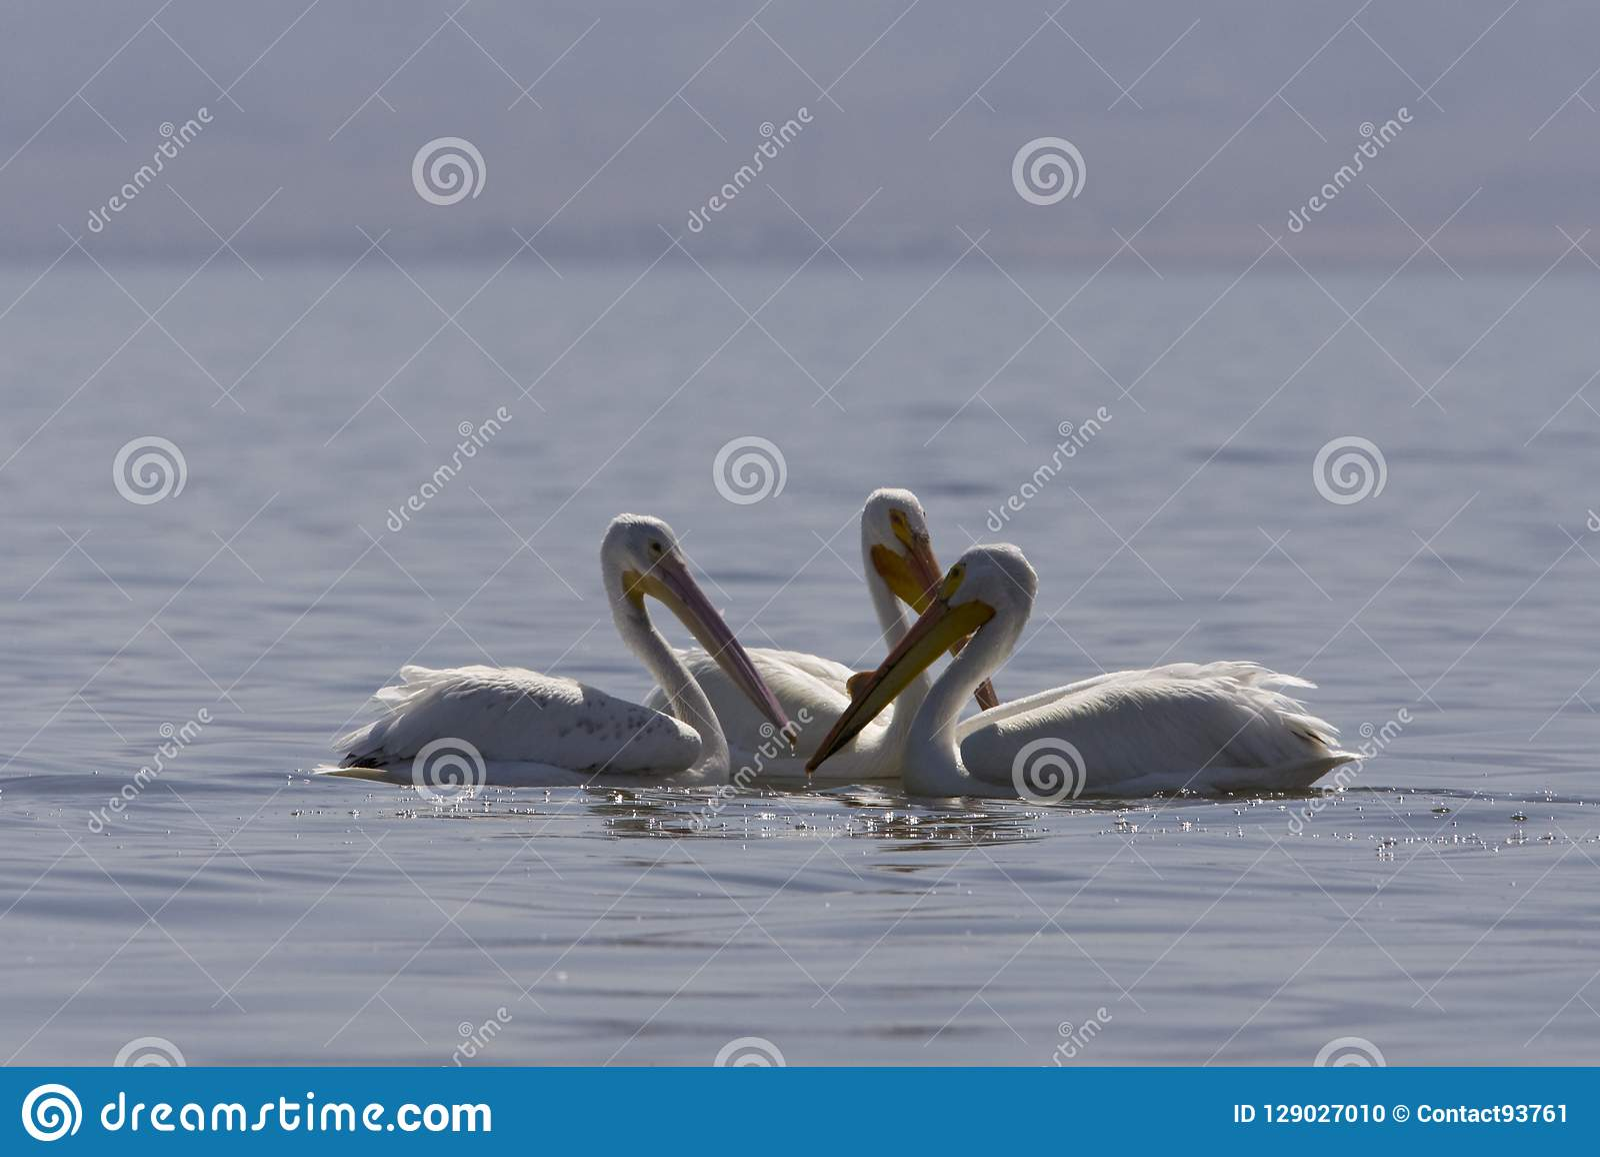 Witte Pelikaan, amerikansk vit pelikan, Pelecanuserythrorhyncho